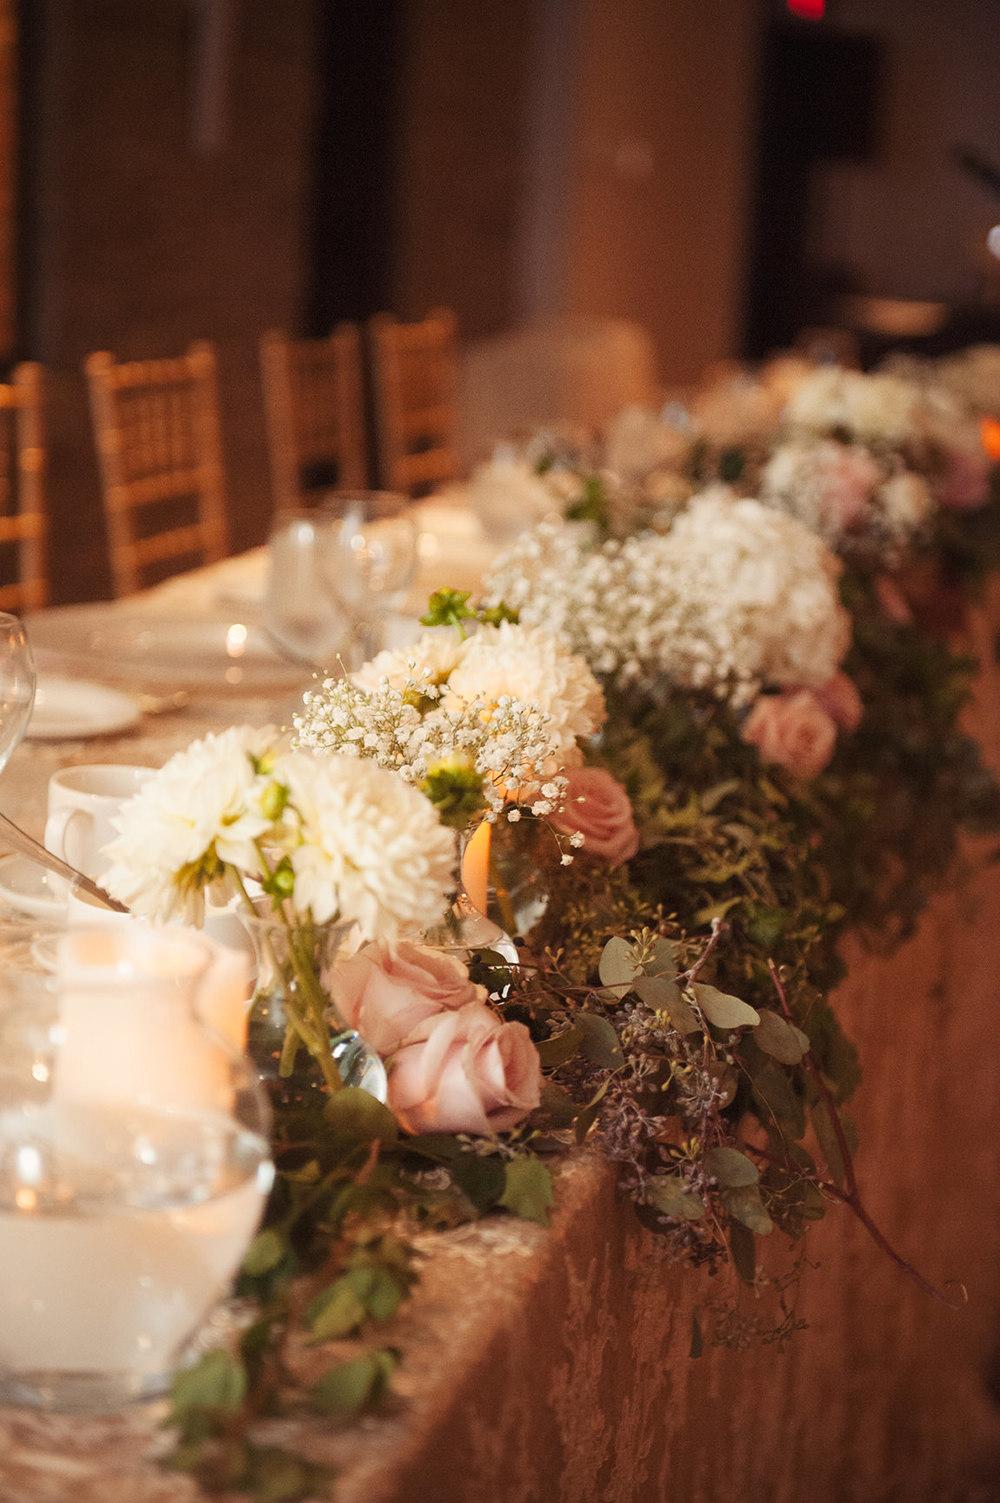 St-Catharines-Wedding-Stone-Mill-Inn-Amy-Darryl-photography-by-Morgan-Falk-067.JPG